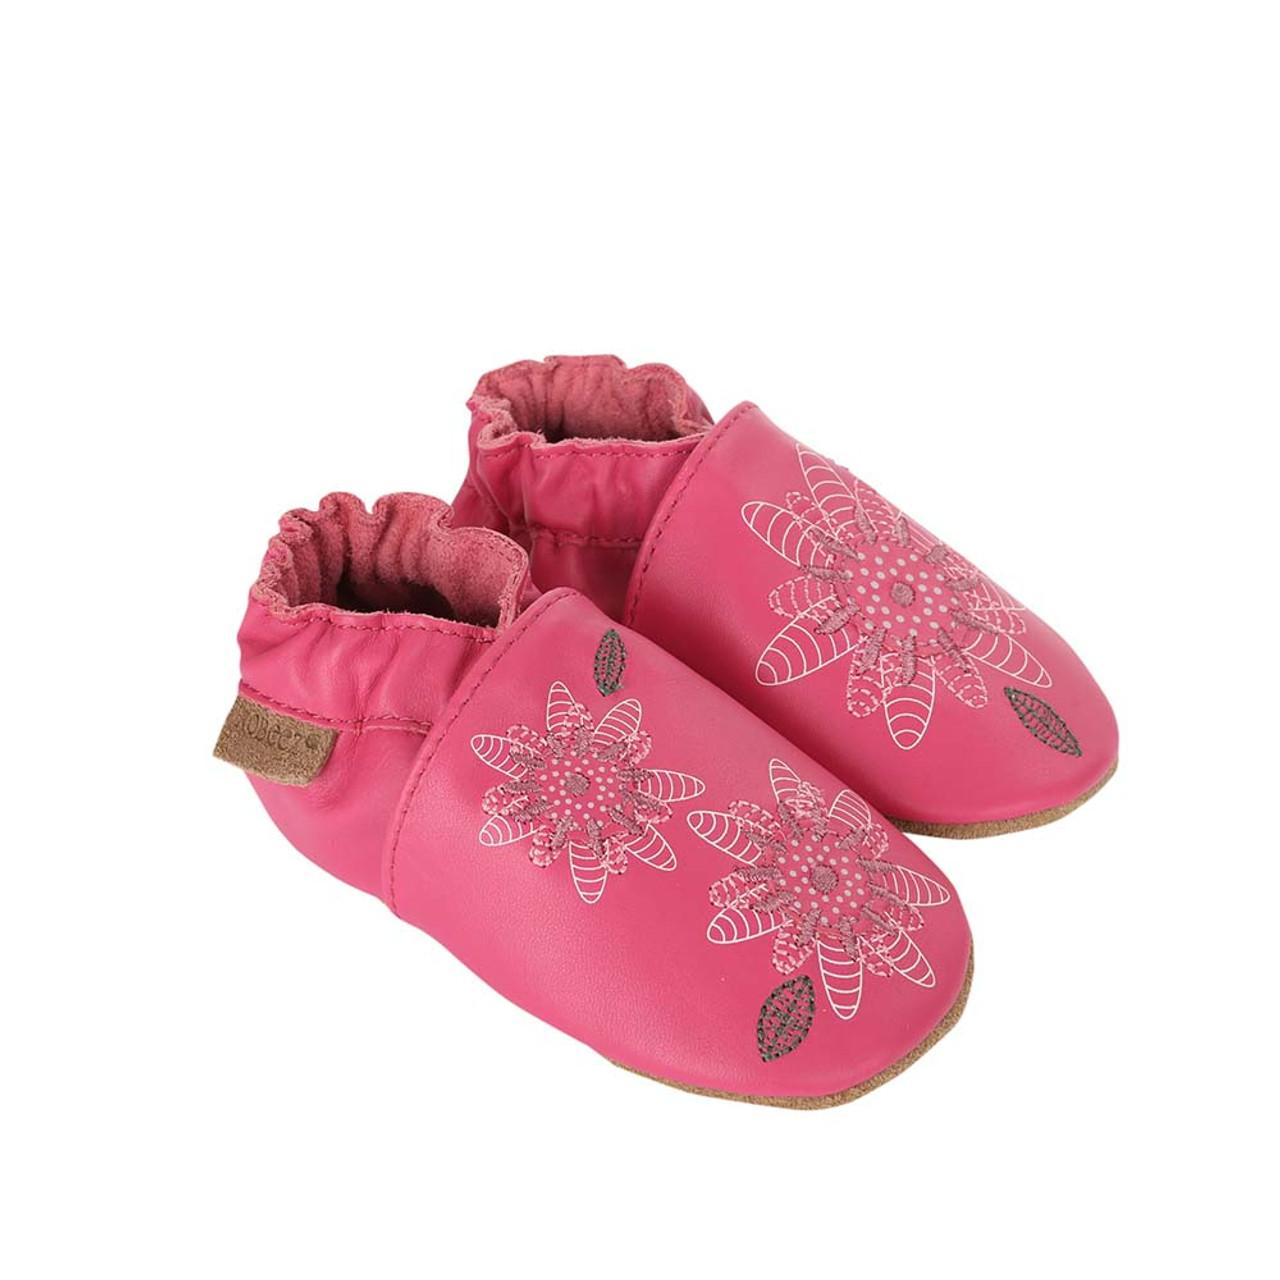 17cdafc66d6cb Fiona Flower Baby Shoes, Soft Soles